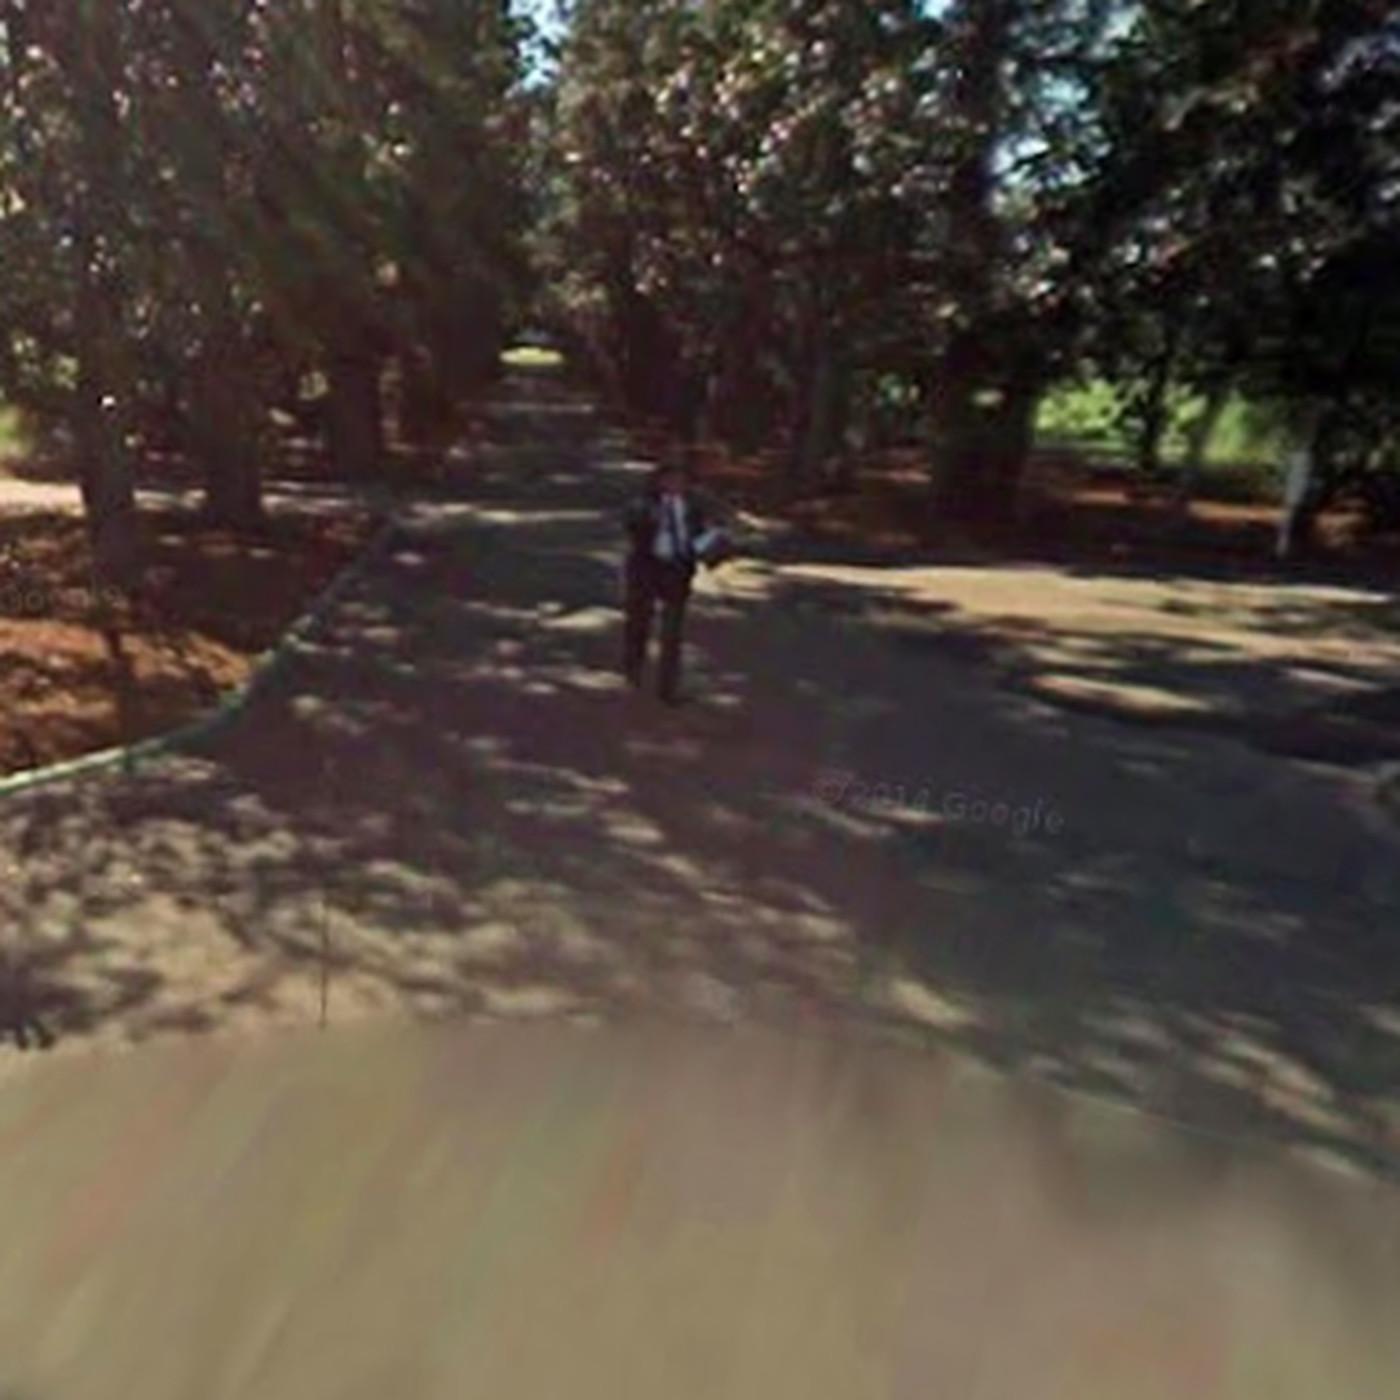 Drive A Google Maps Car on